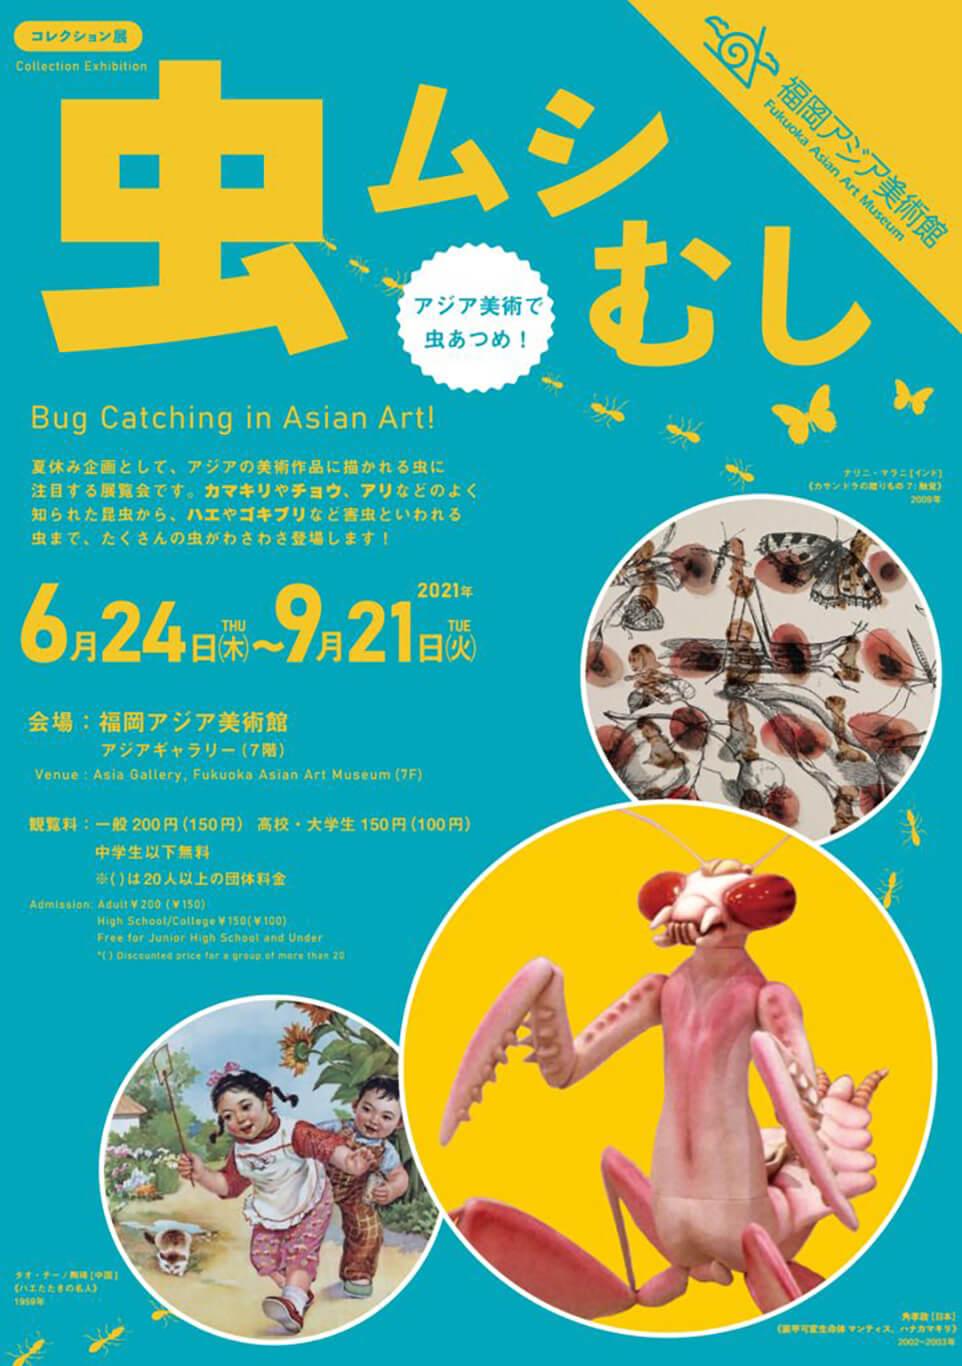 faam-202106-虫 コレクション展